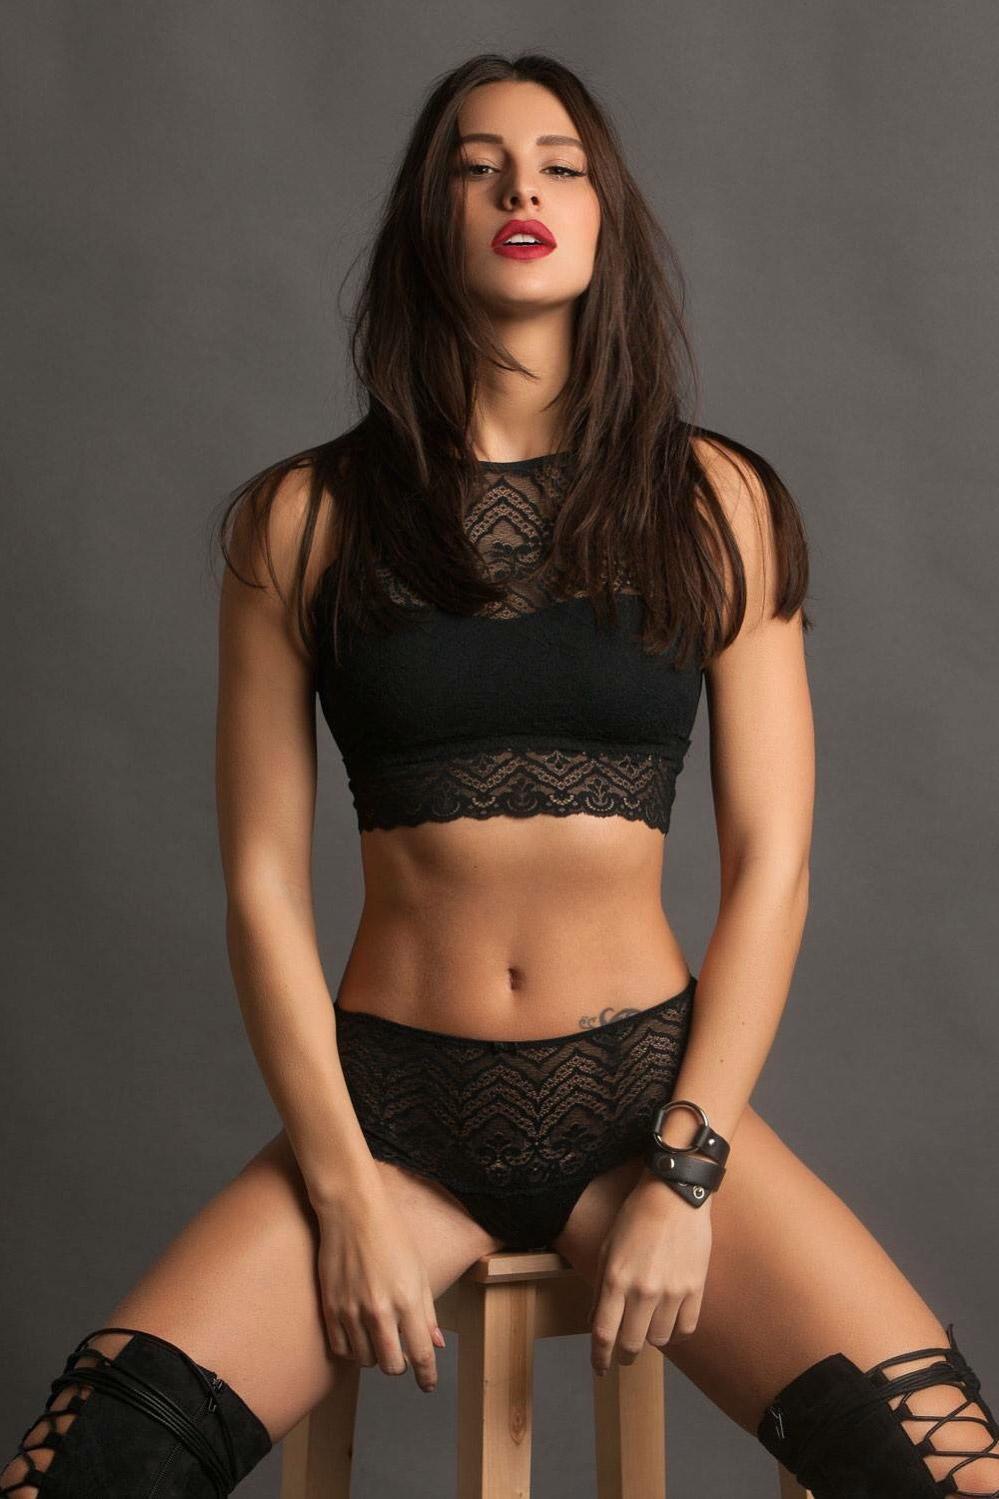 modella influencer presentatrice TV showroom, eventi, modella mediterranea mediterranean model brunette model modeling modella Roma